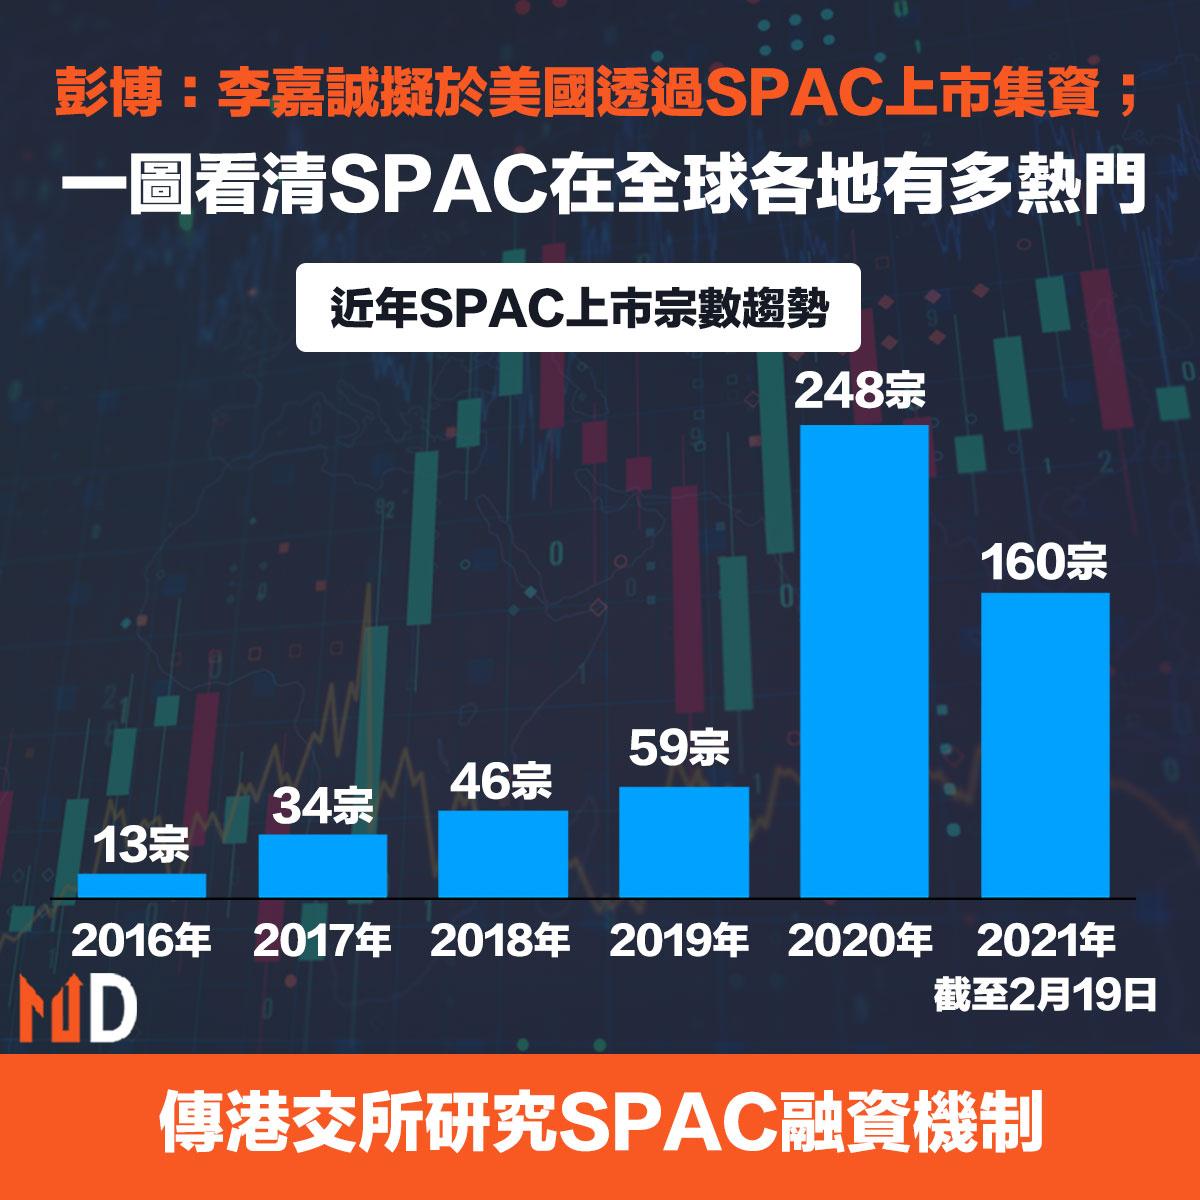 SPAC在全球更熾熱